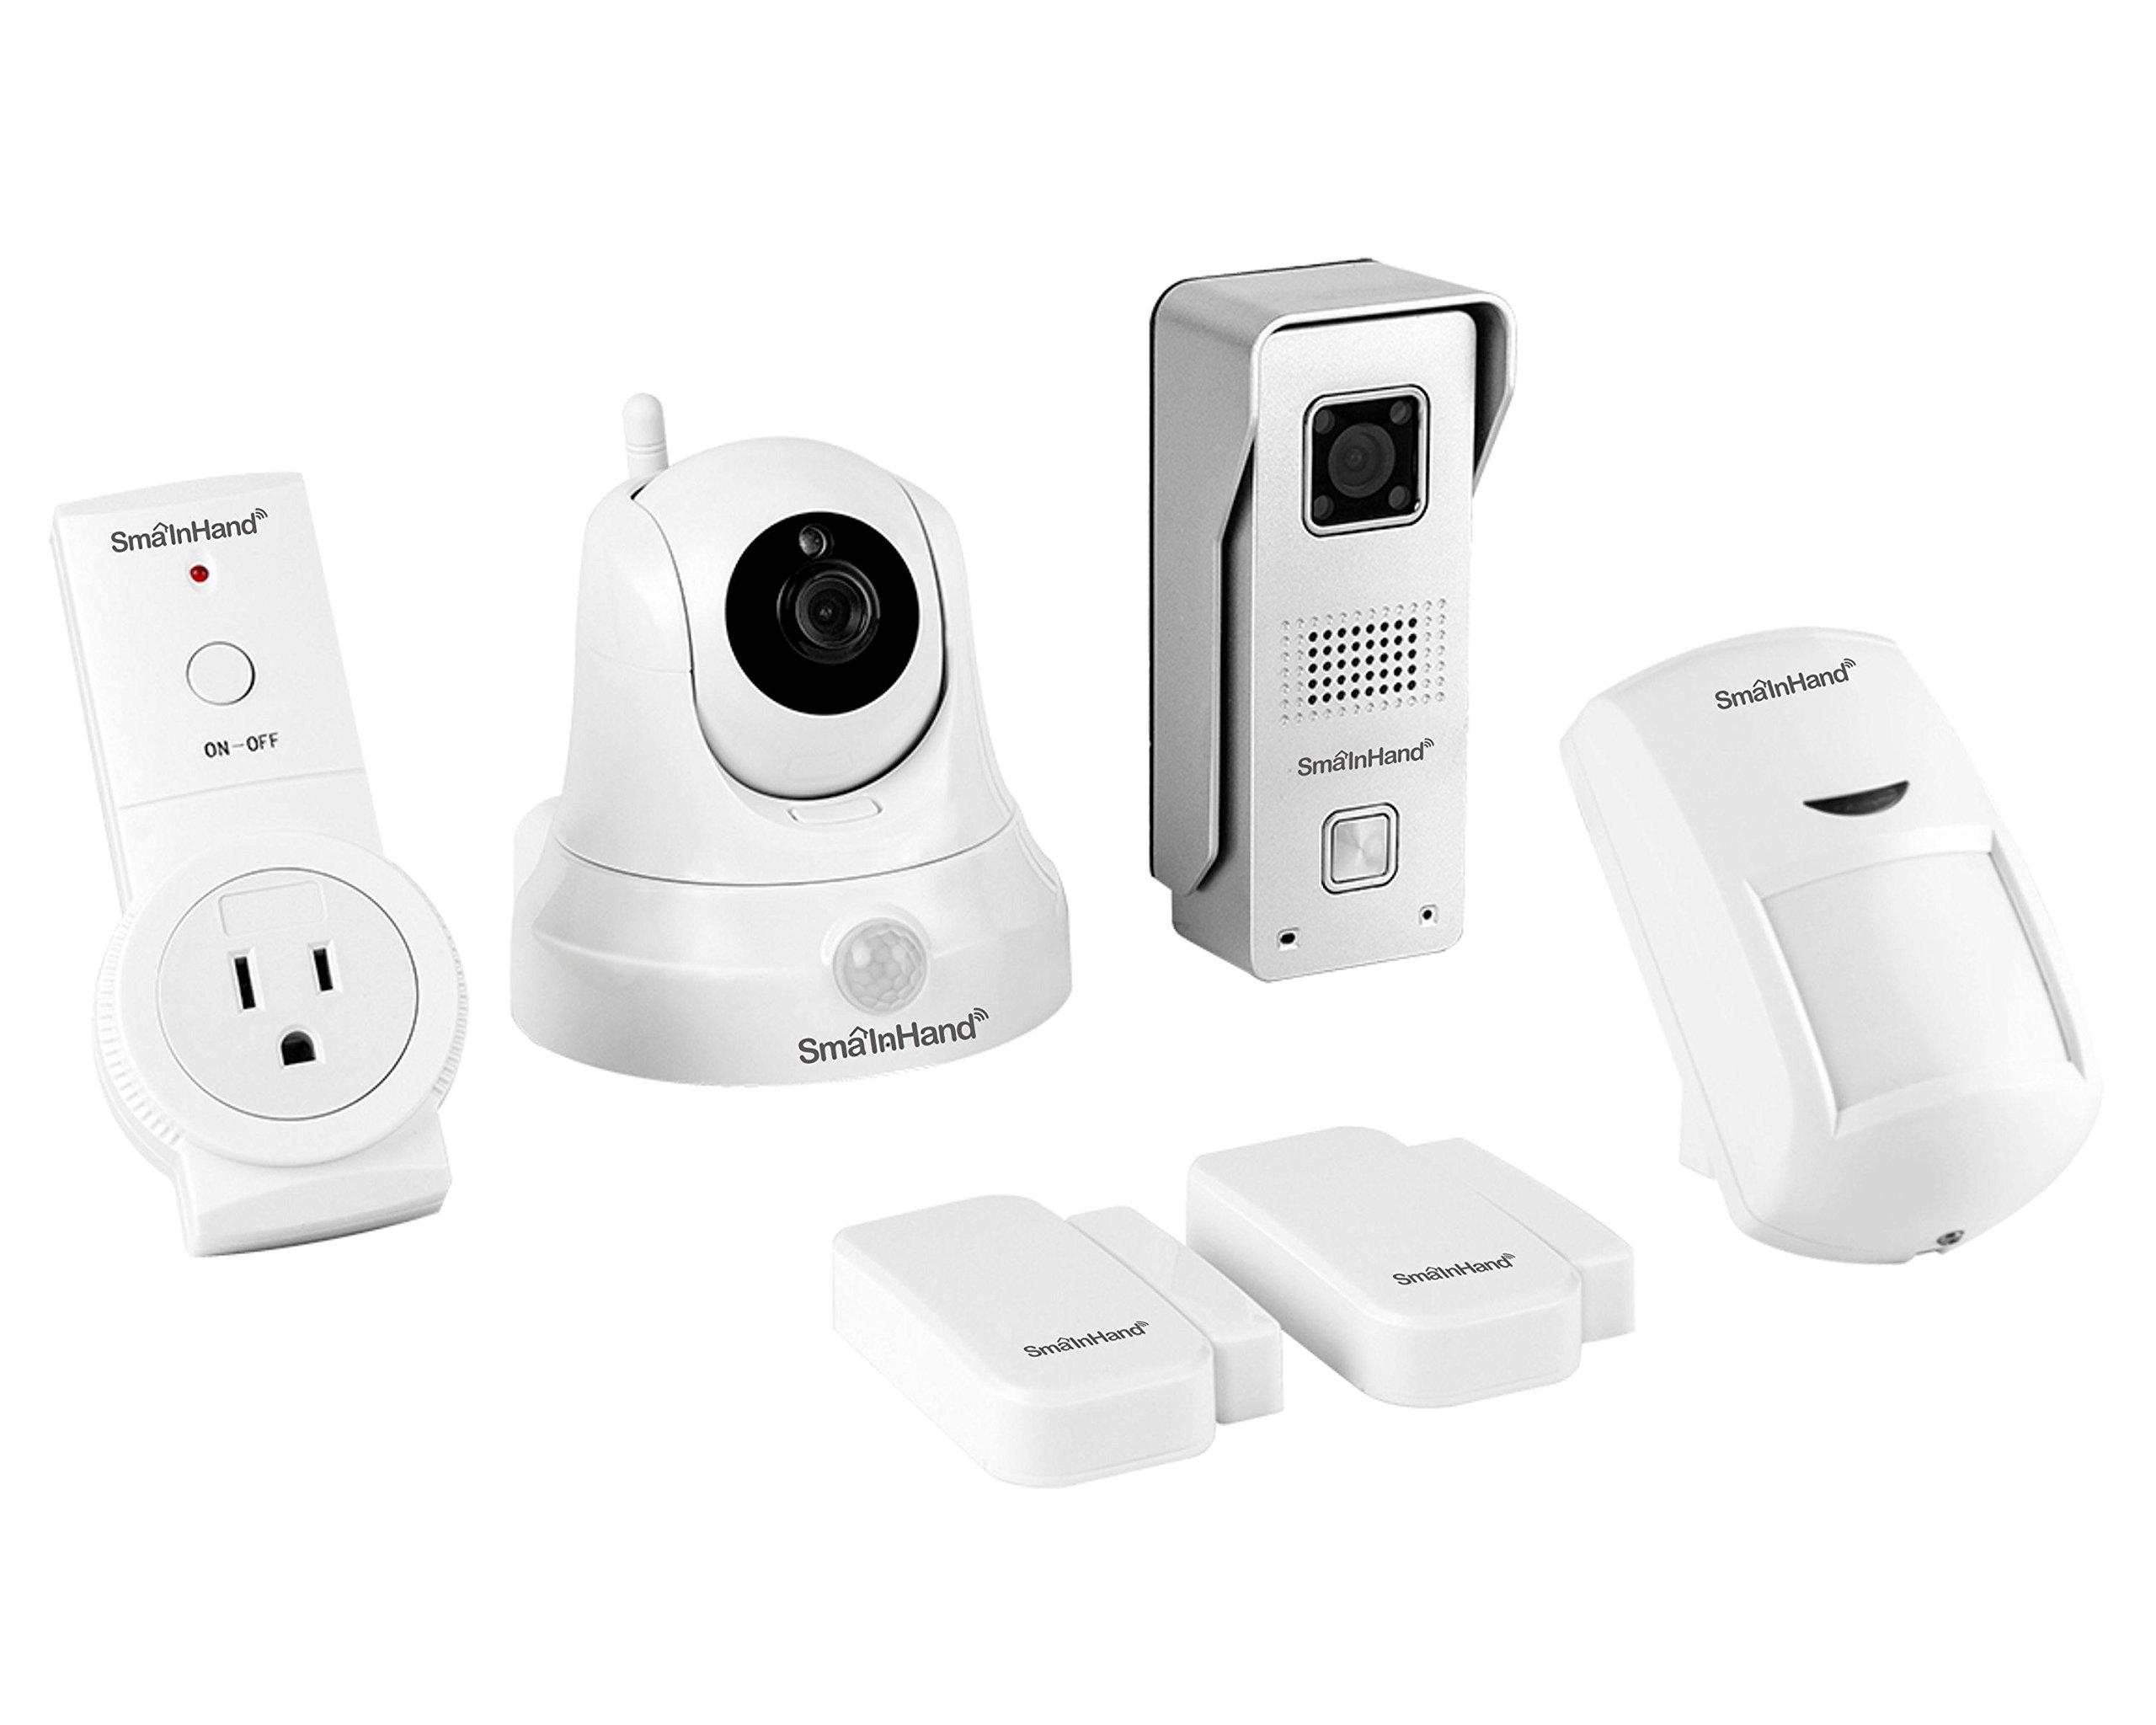 SmaInHand 4Smart Preferred Package, Intercom,Home Automation and Alarm, 1 WiFi Camera, 1 Wifi Doorbell, 1 Wireless Socket, 1 Motion Sensor and 2 Door/Window Sensor for USA